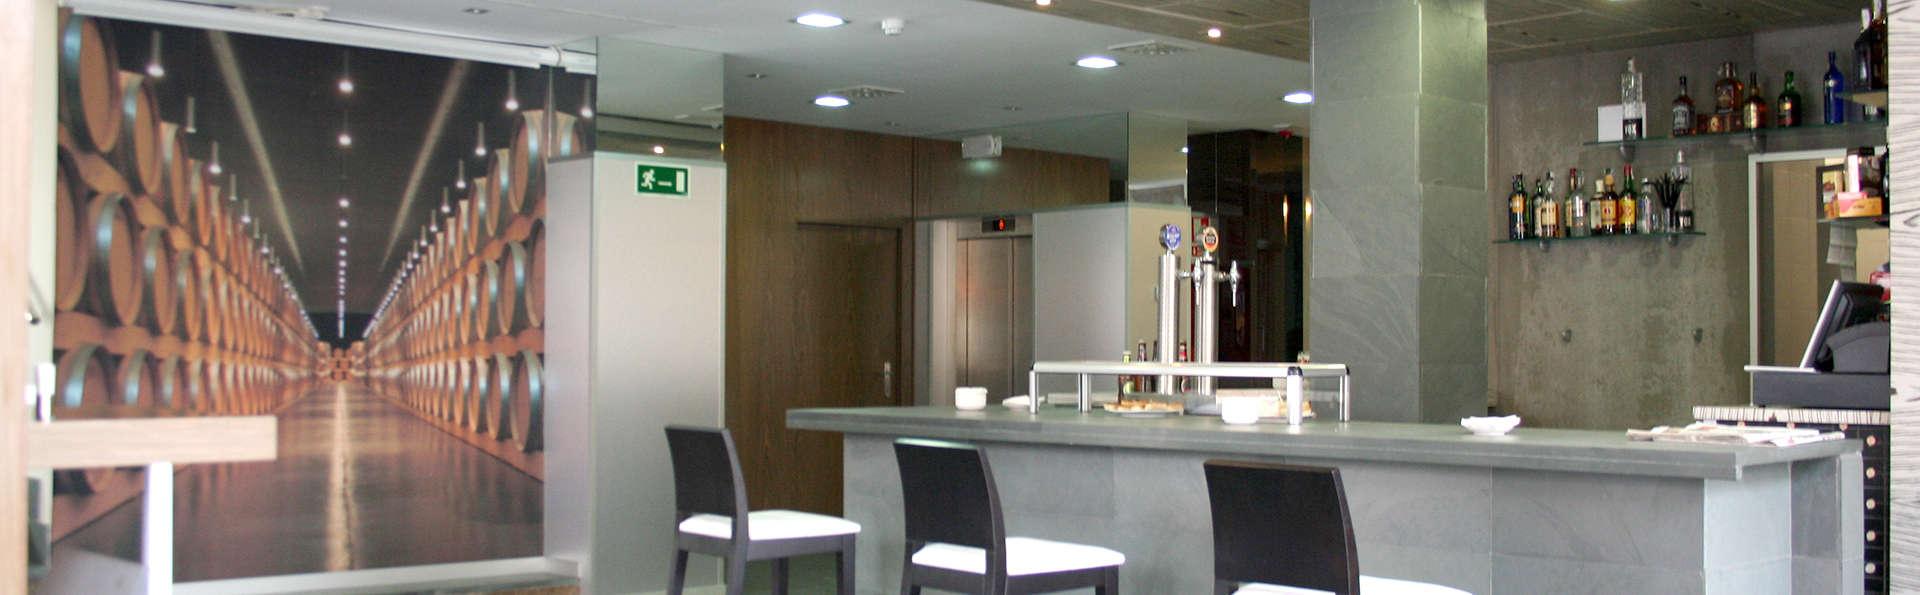 Hotel Duero  - Edit_Bar.jpg